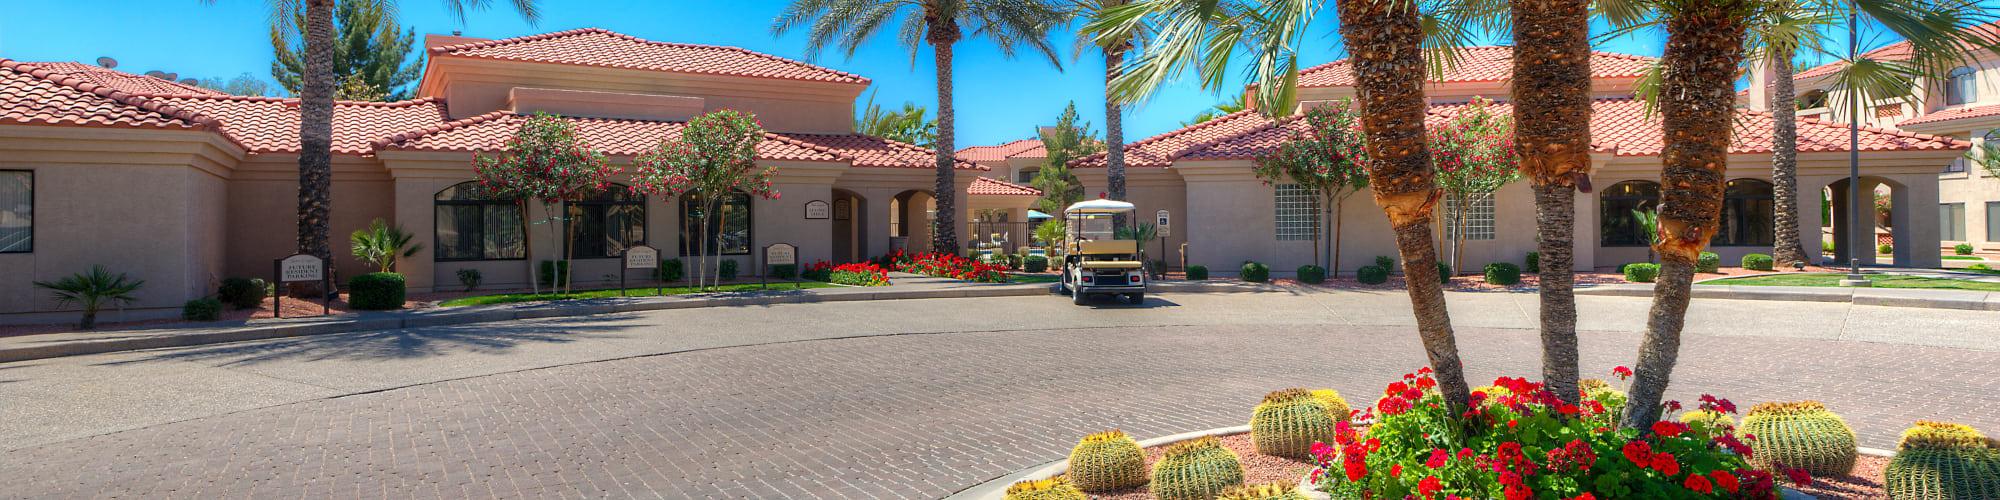 Virtual tour of San Lagos in Glendale, Arizona